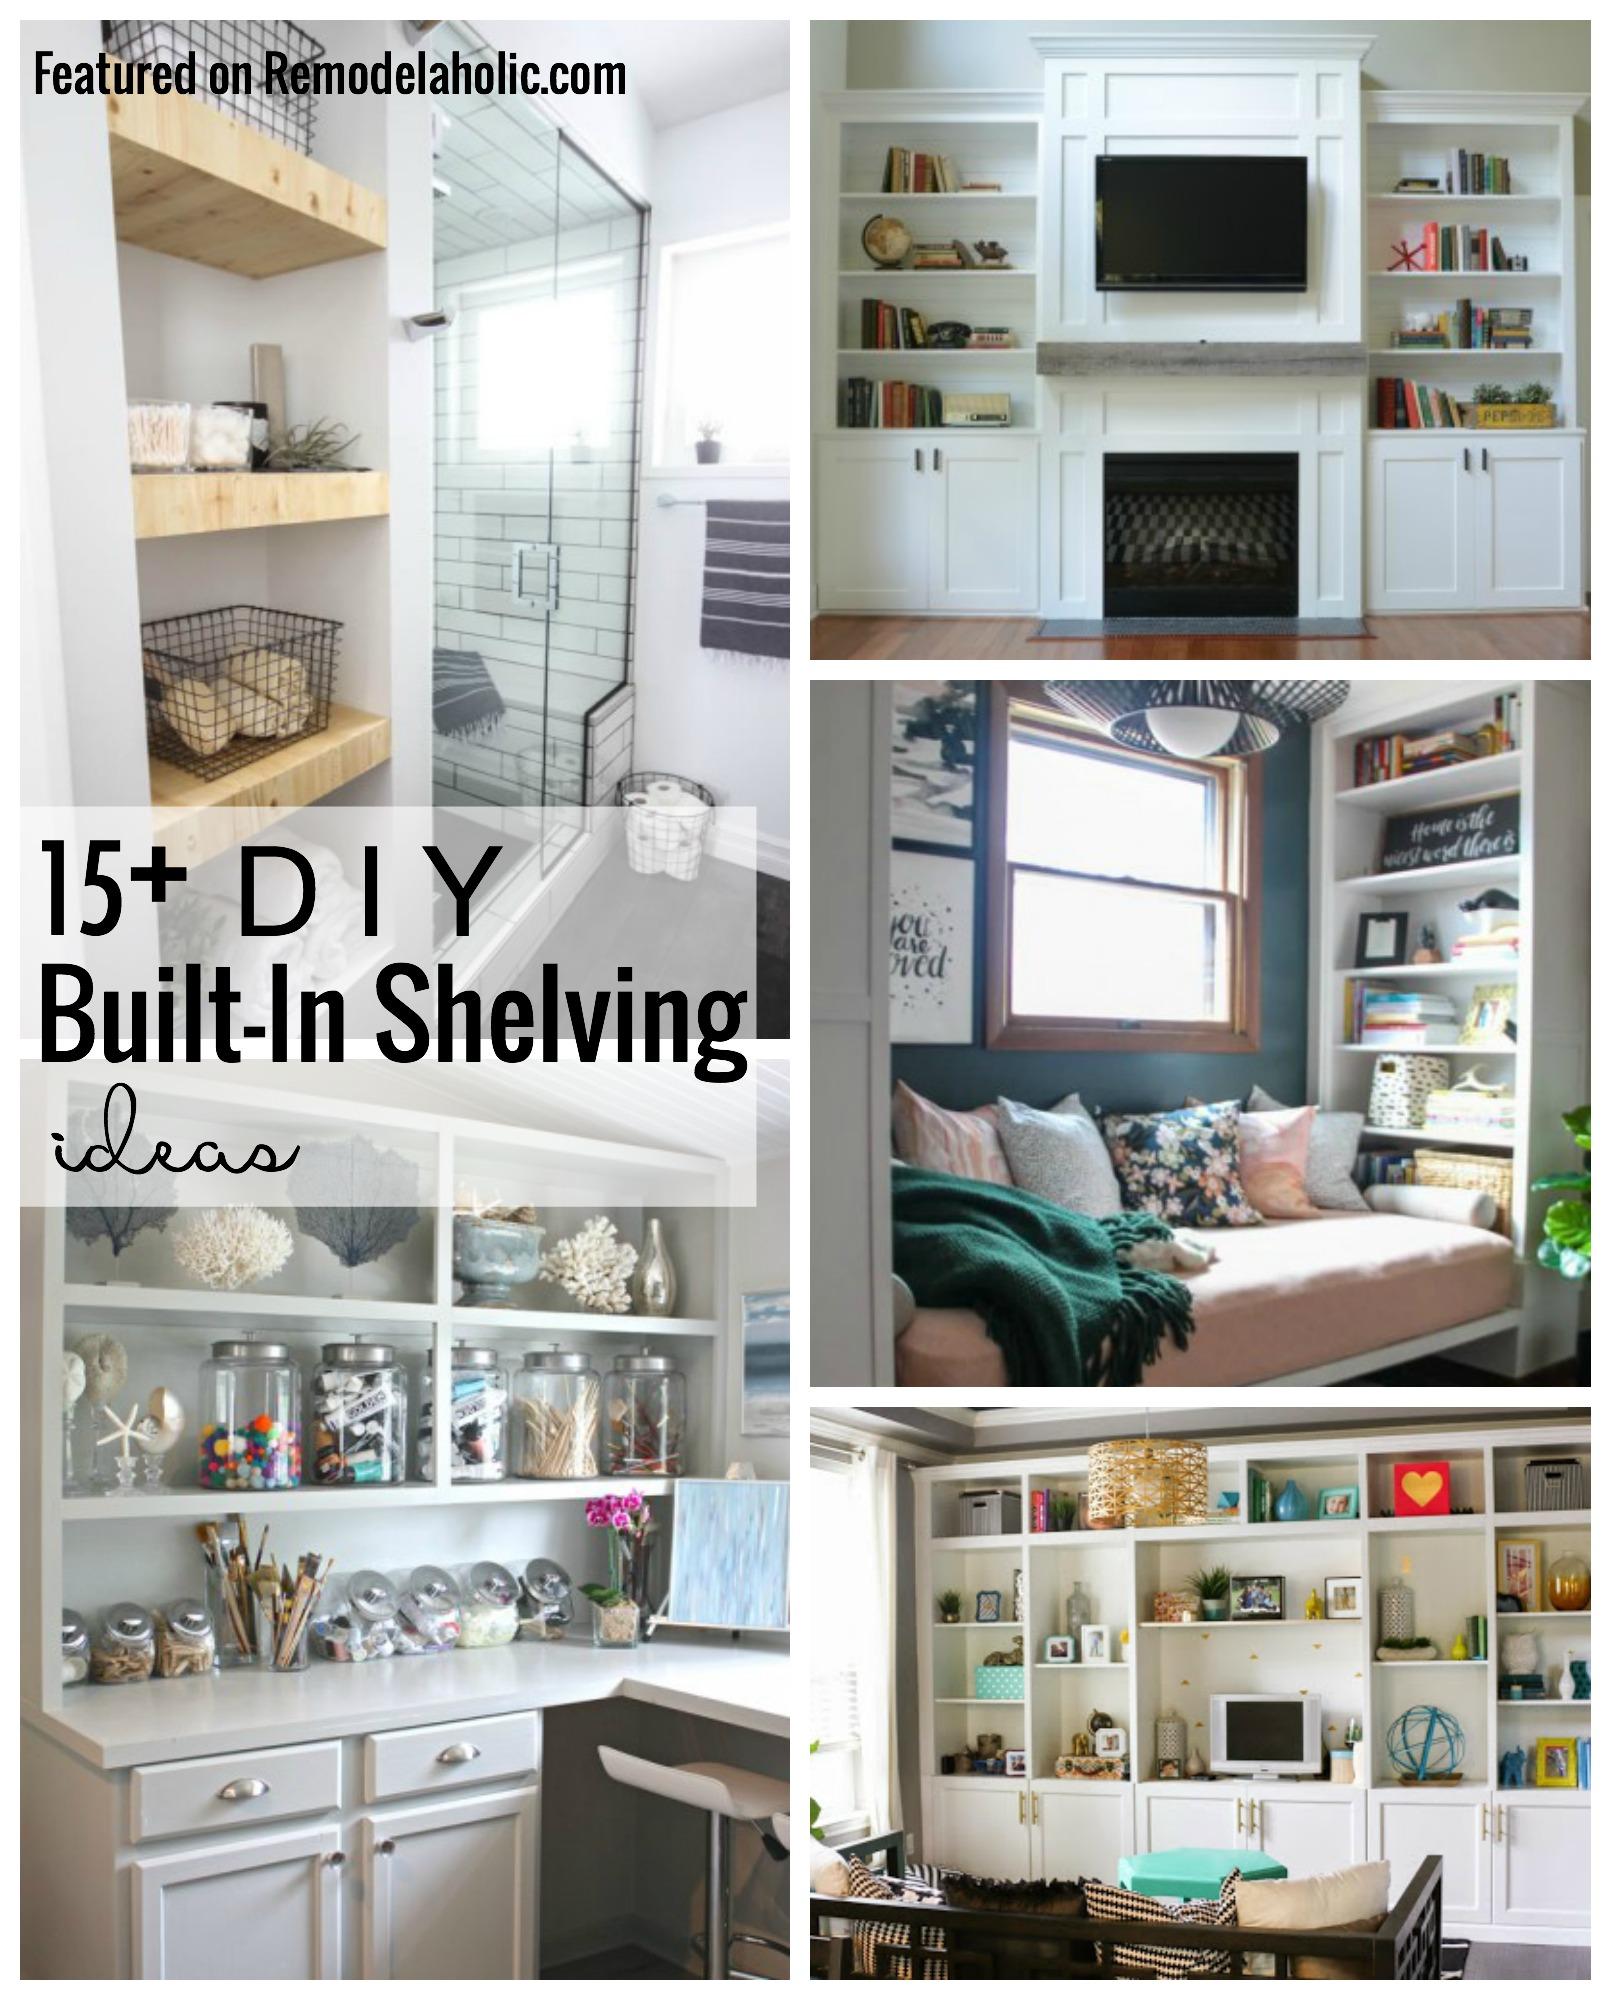 15+ DIY Built In Shelving Ideas